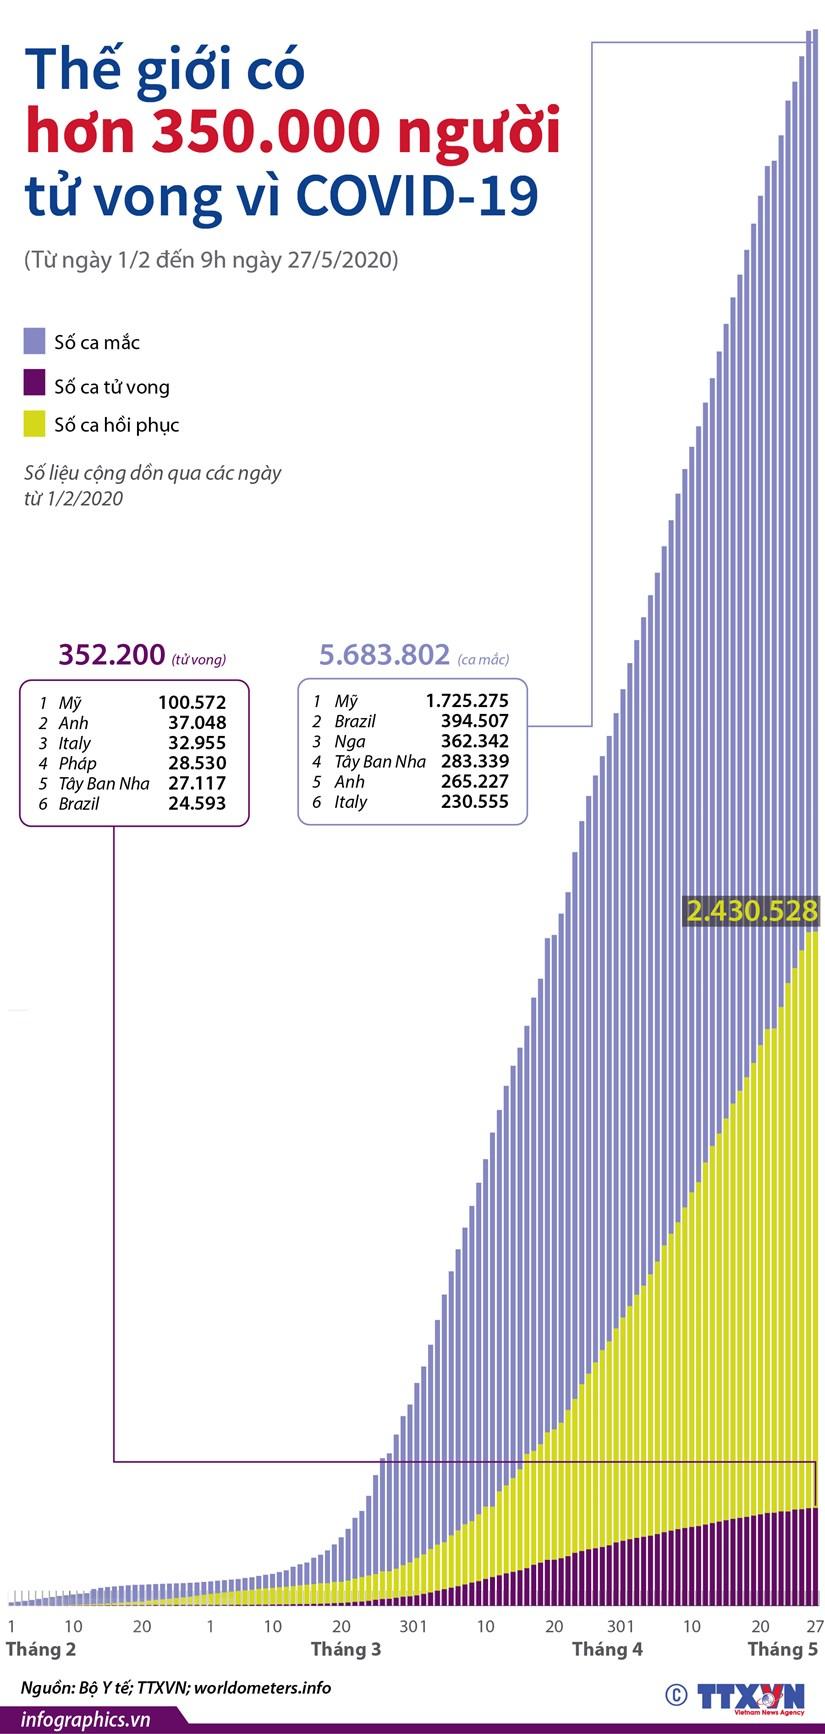 [Infographics] The gioi co hon 350.000 nguoi tu vong vi COVID-19 hinh anh 1